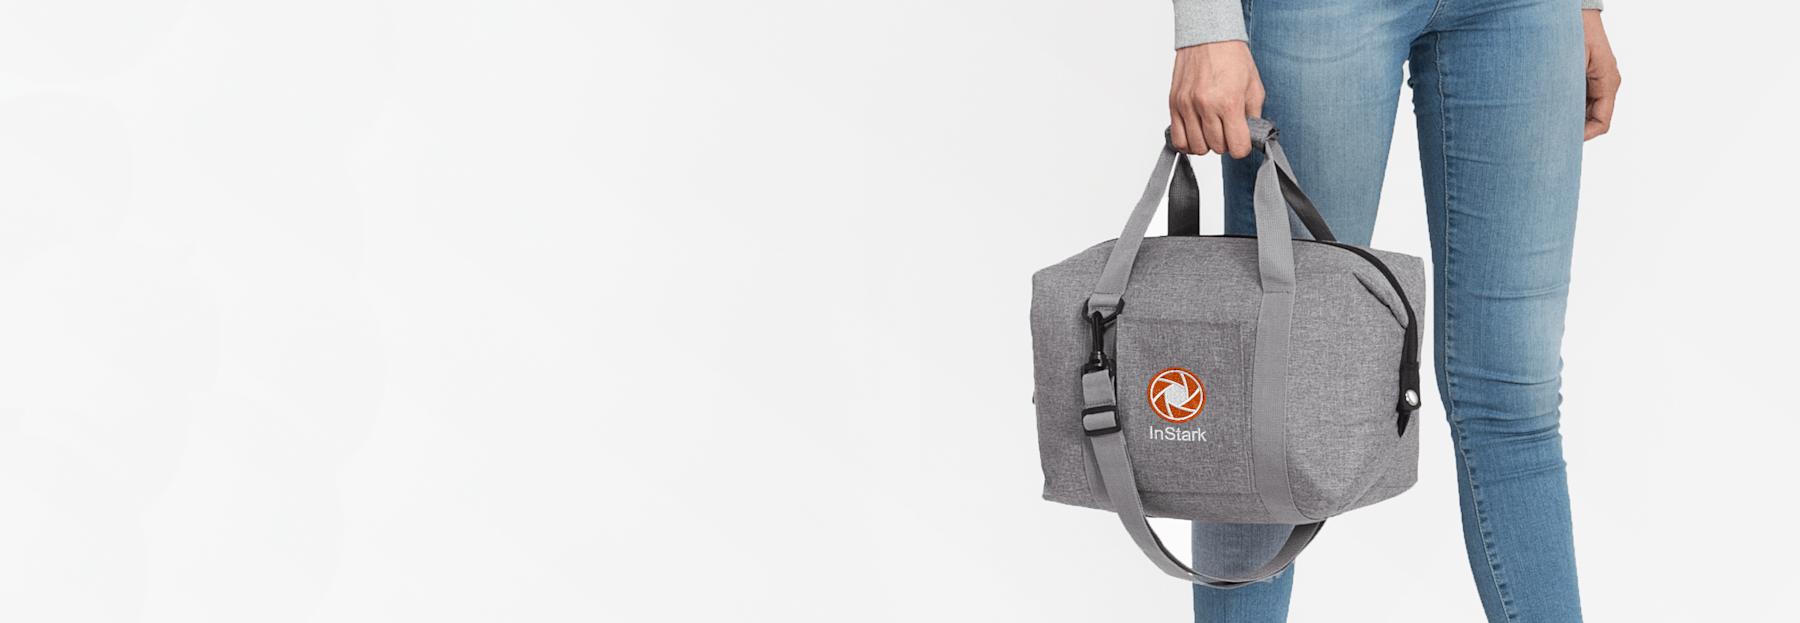 Personalised Cooler Bags